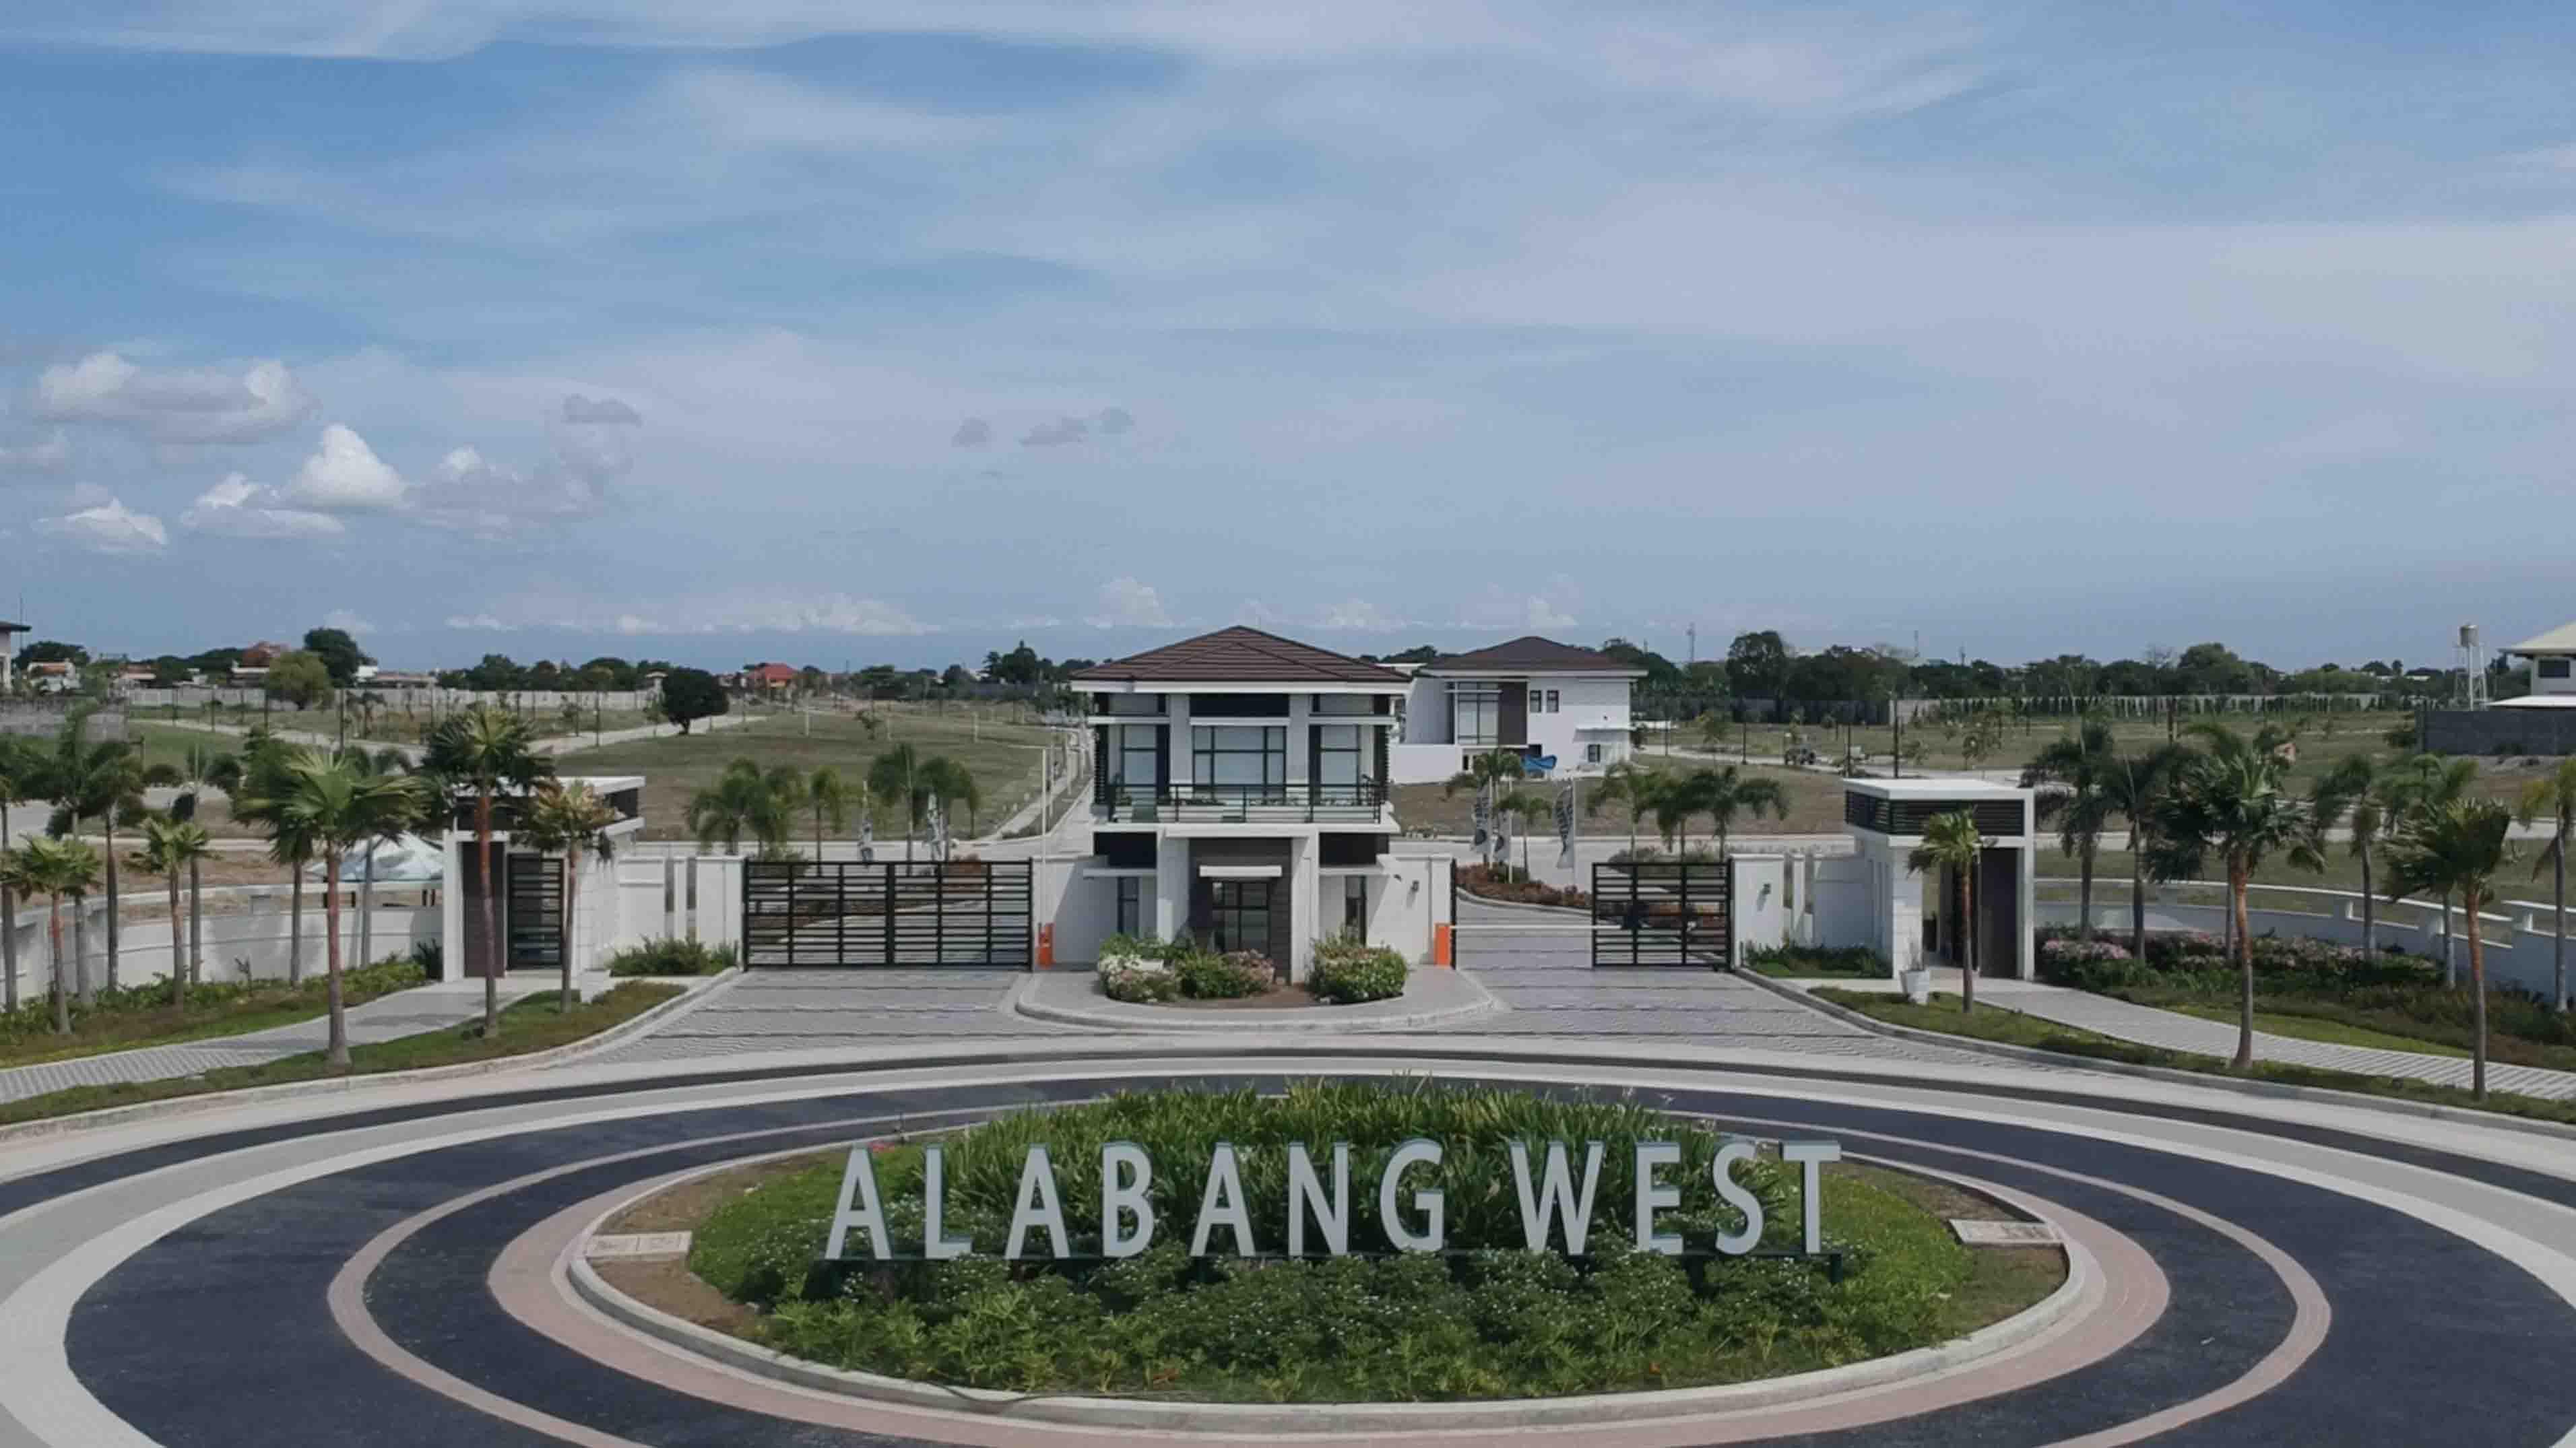 Alabang West